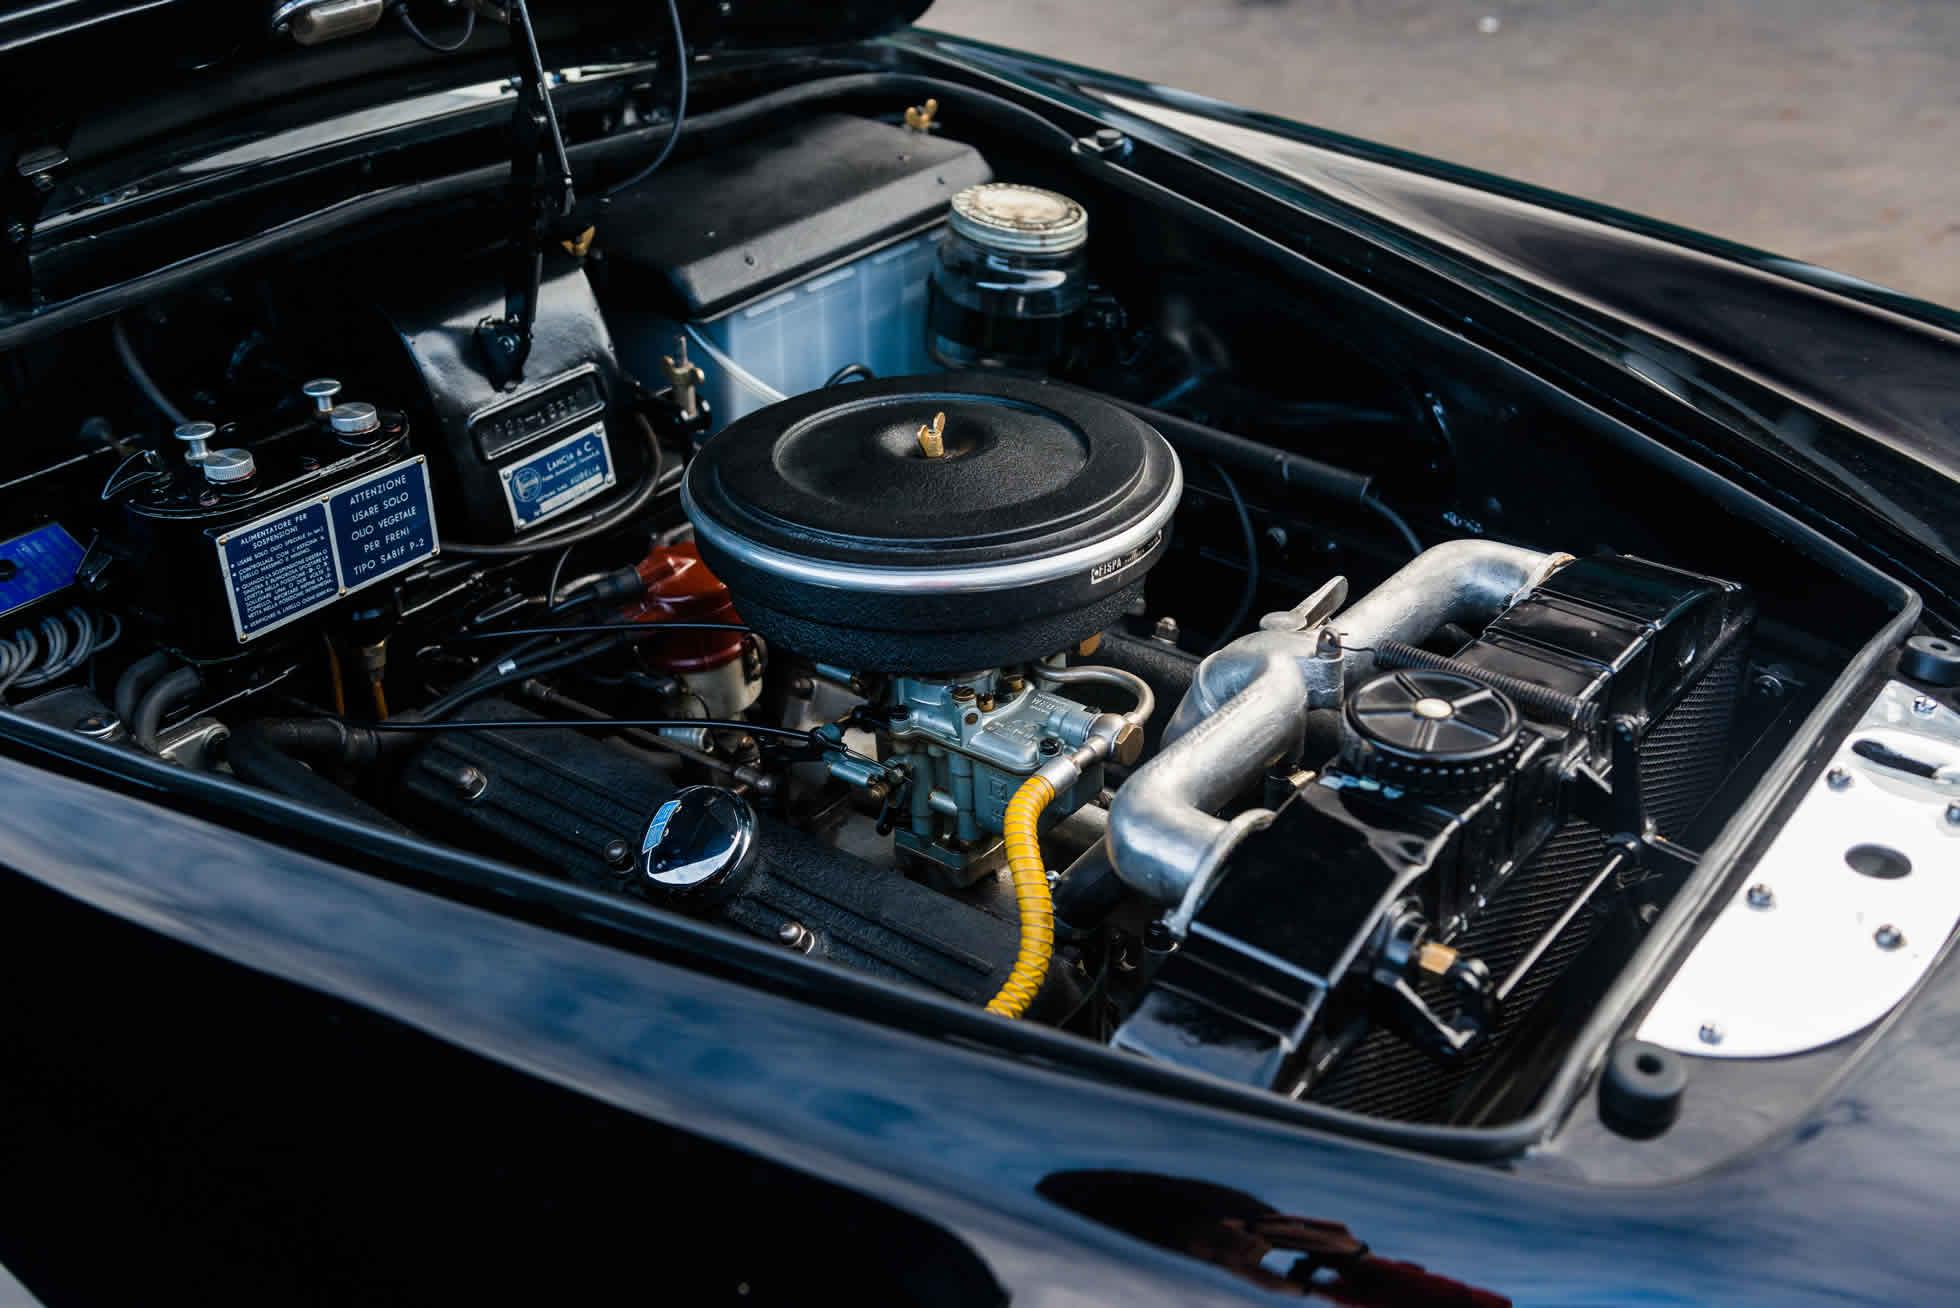 For Sale 1952 Lancia Aurelia B20 Series II Coupe engine detail